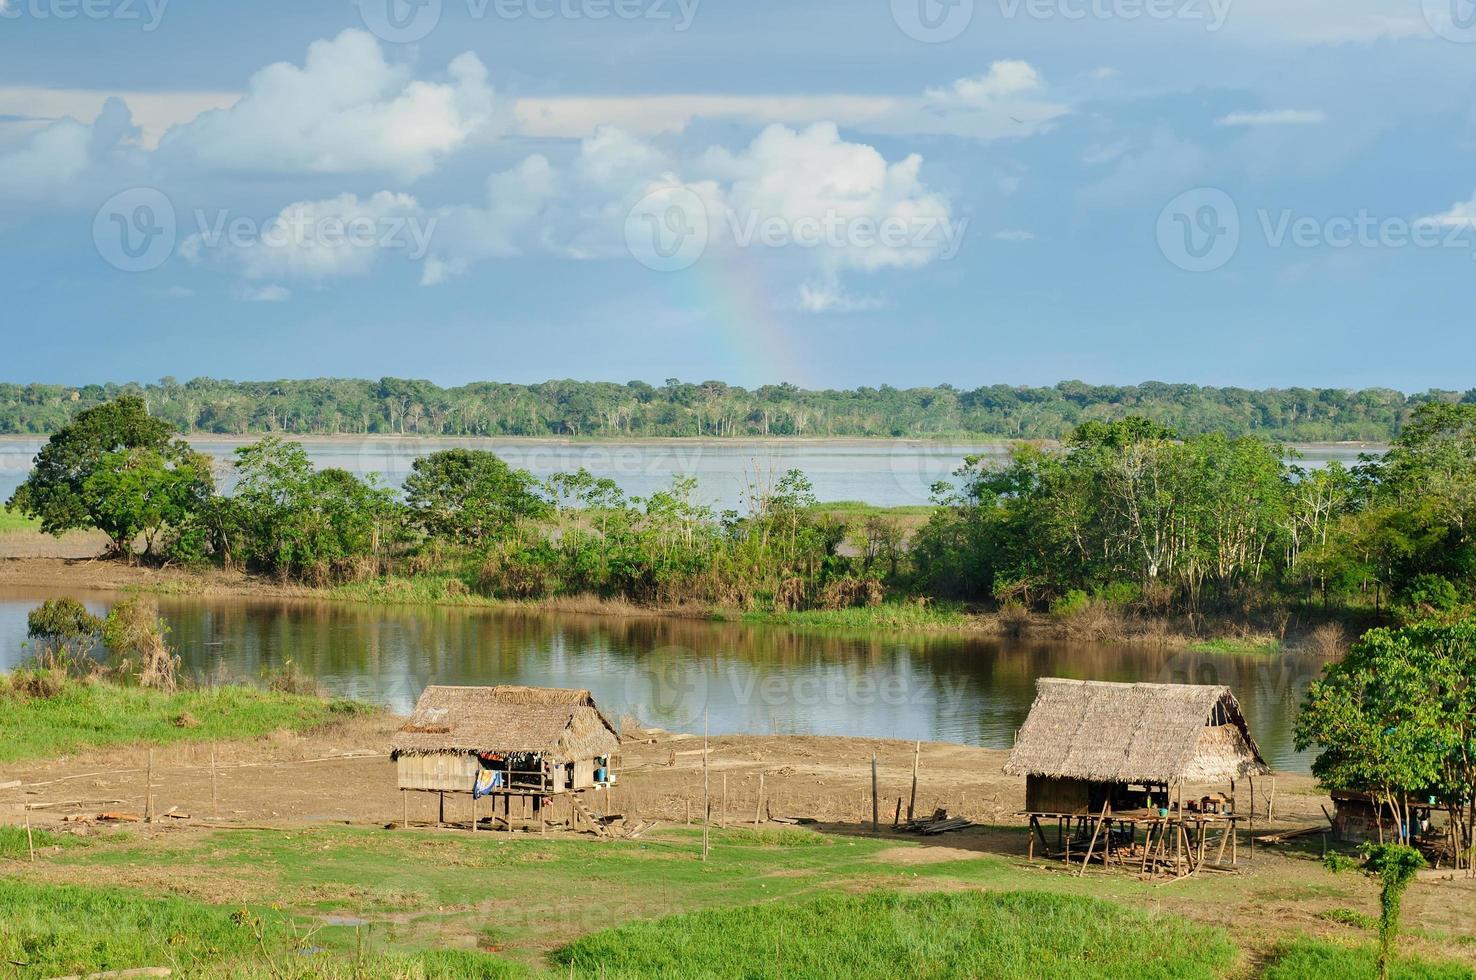 tribù indiane di amazon in brasile foto